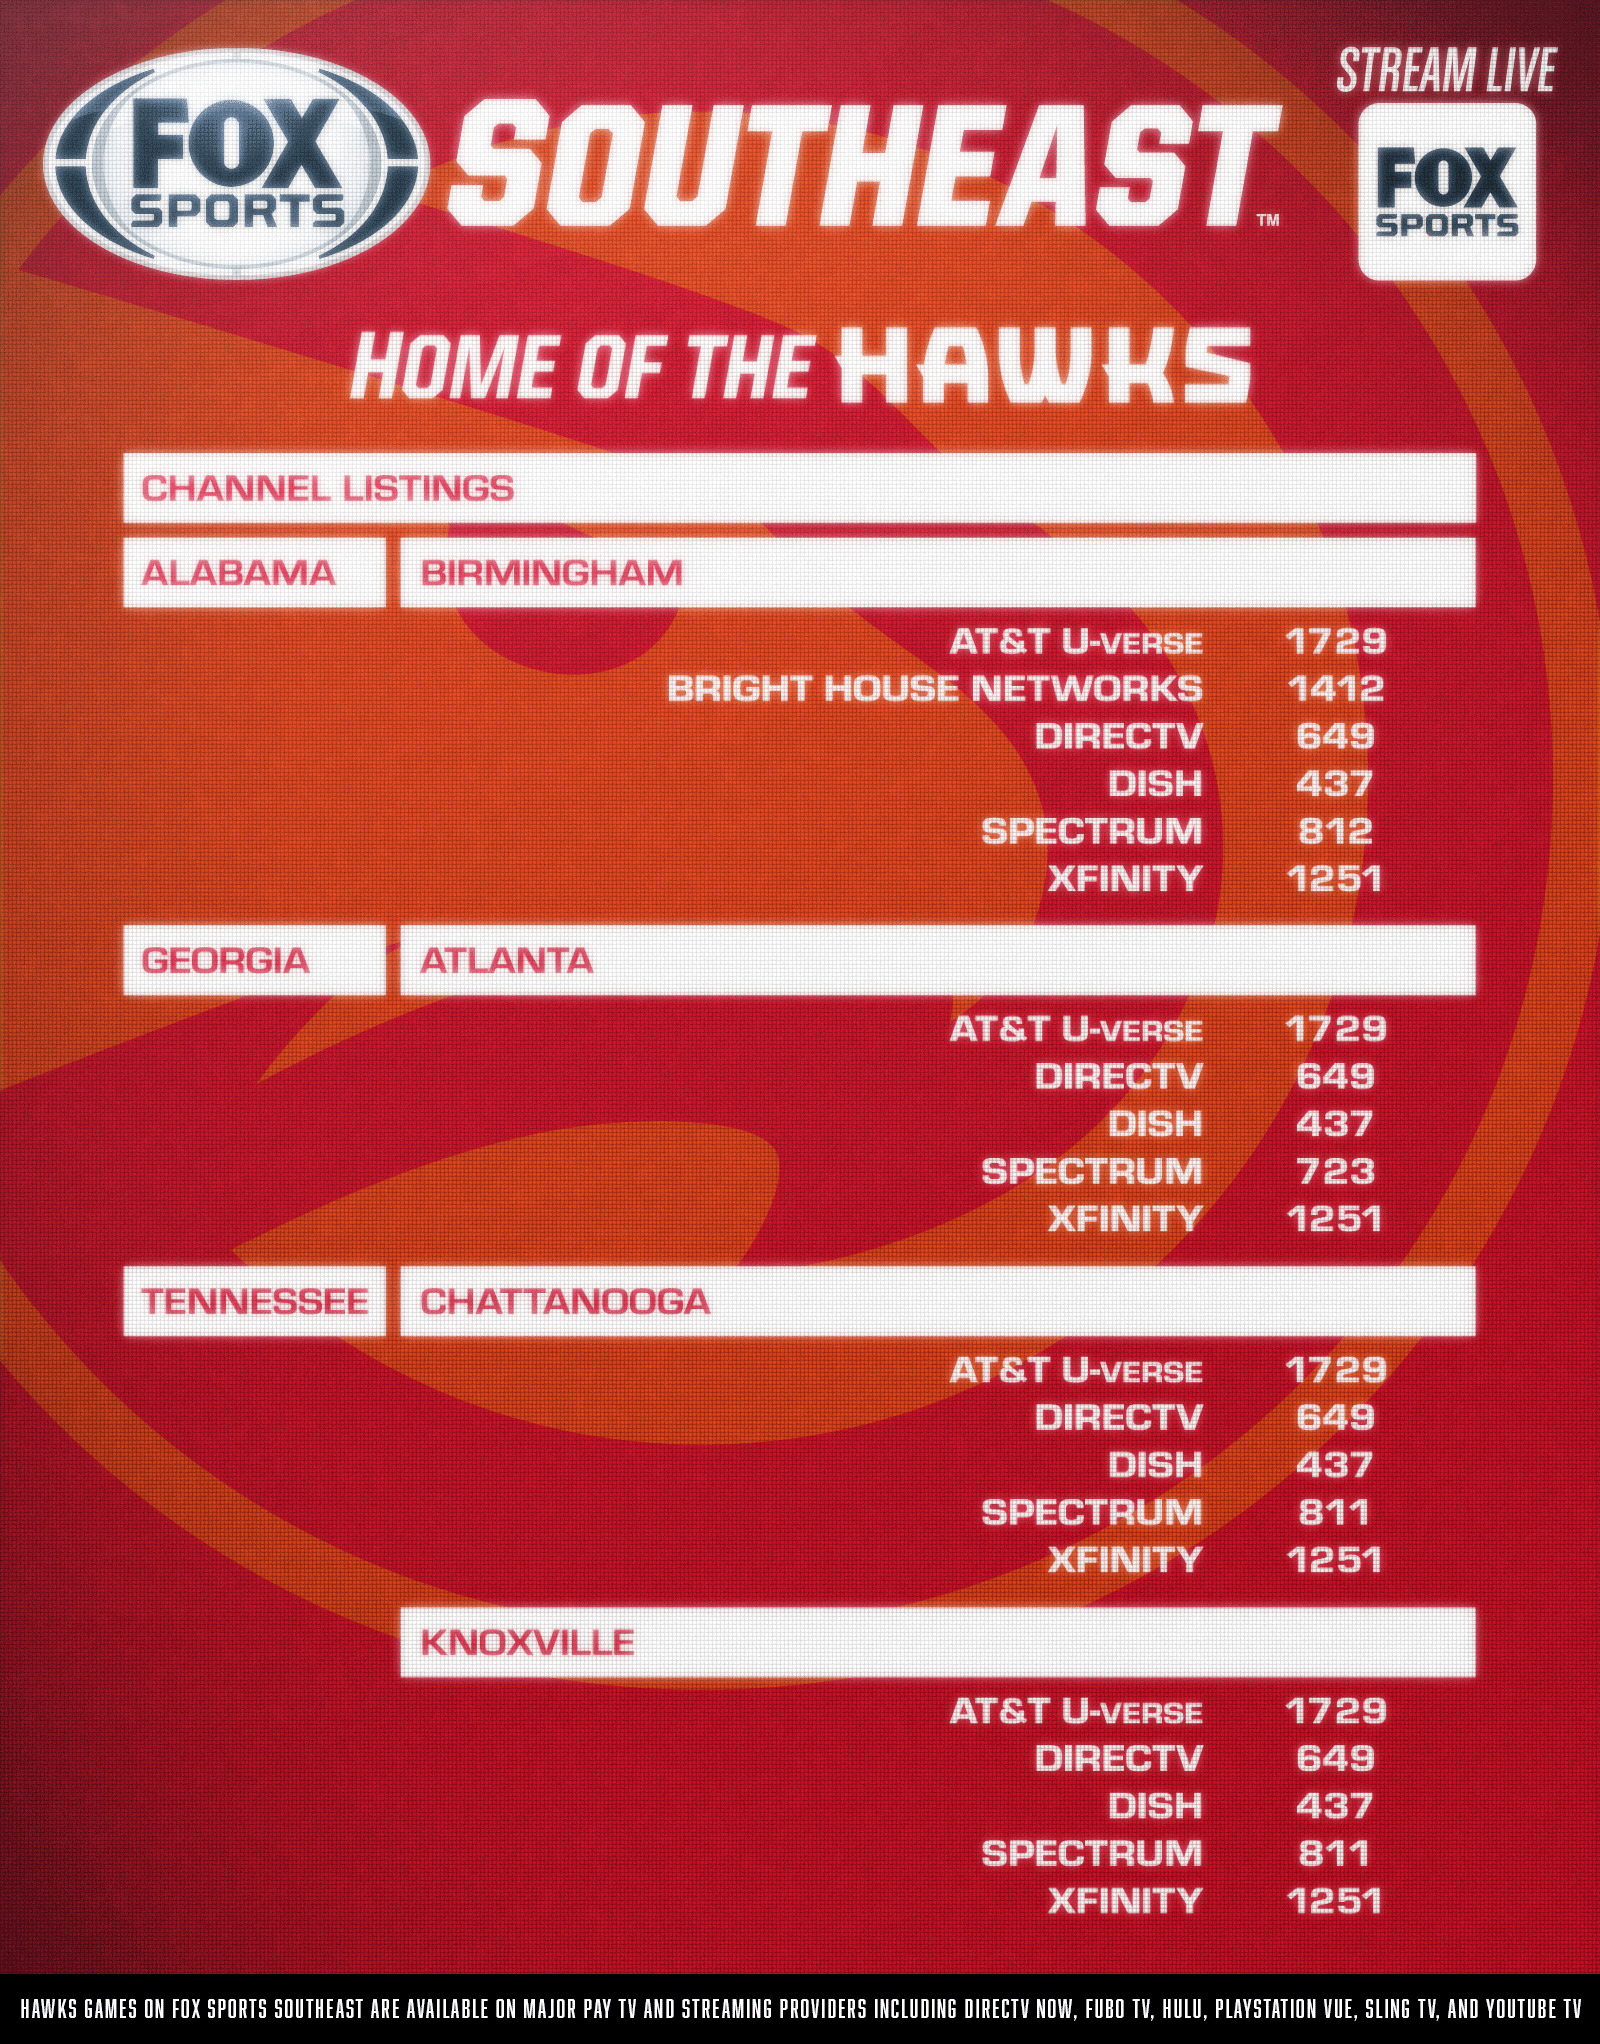 atlanta hawks channel listings | fox sports